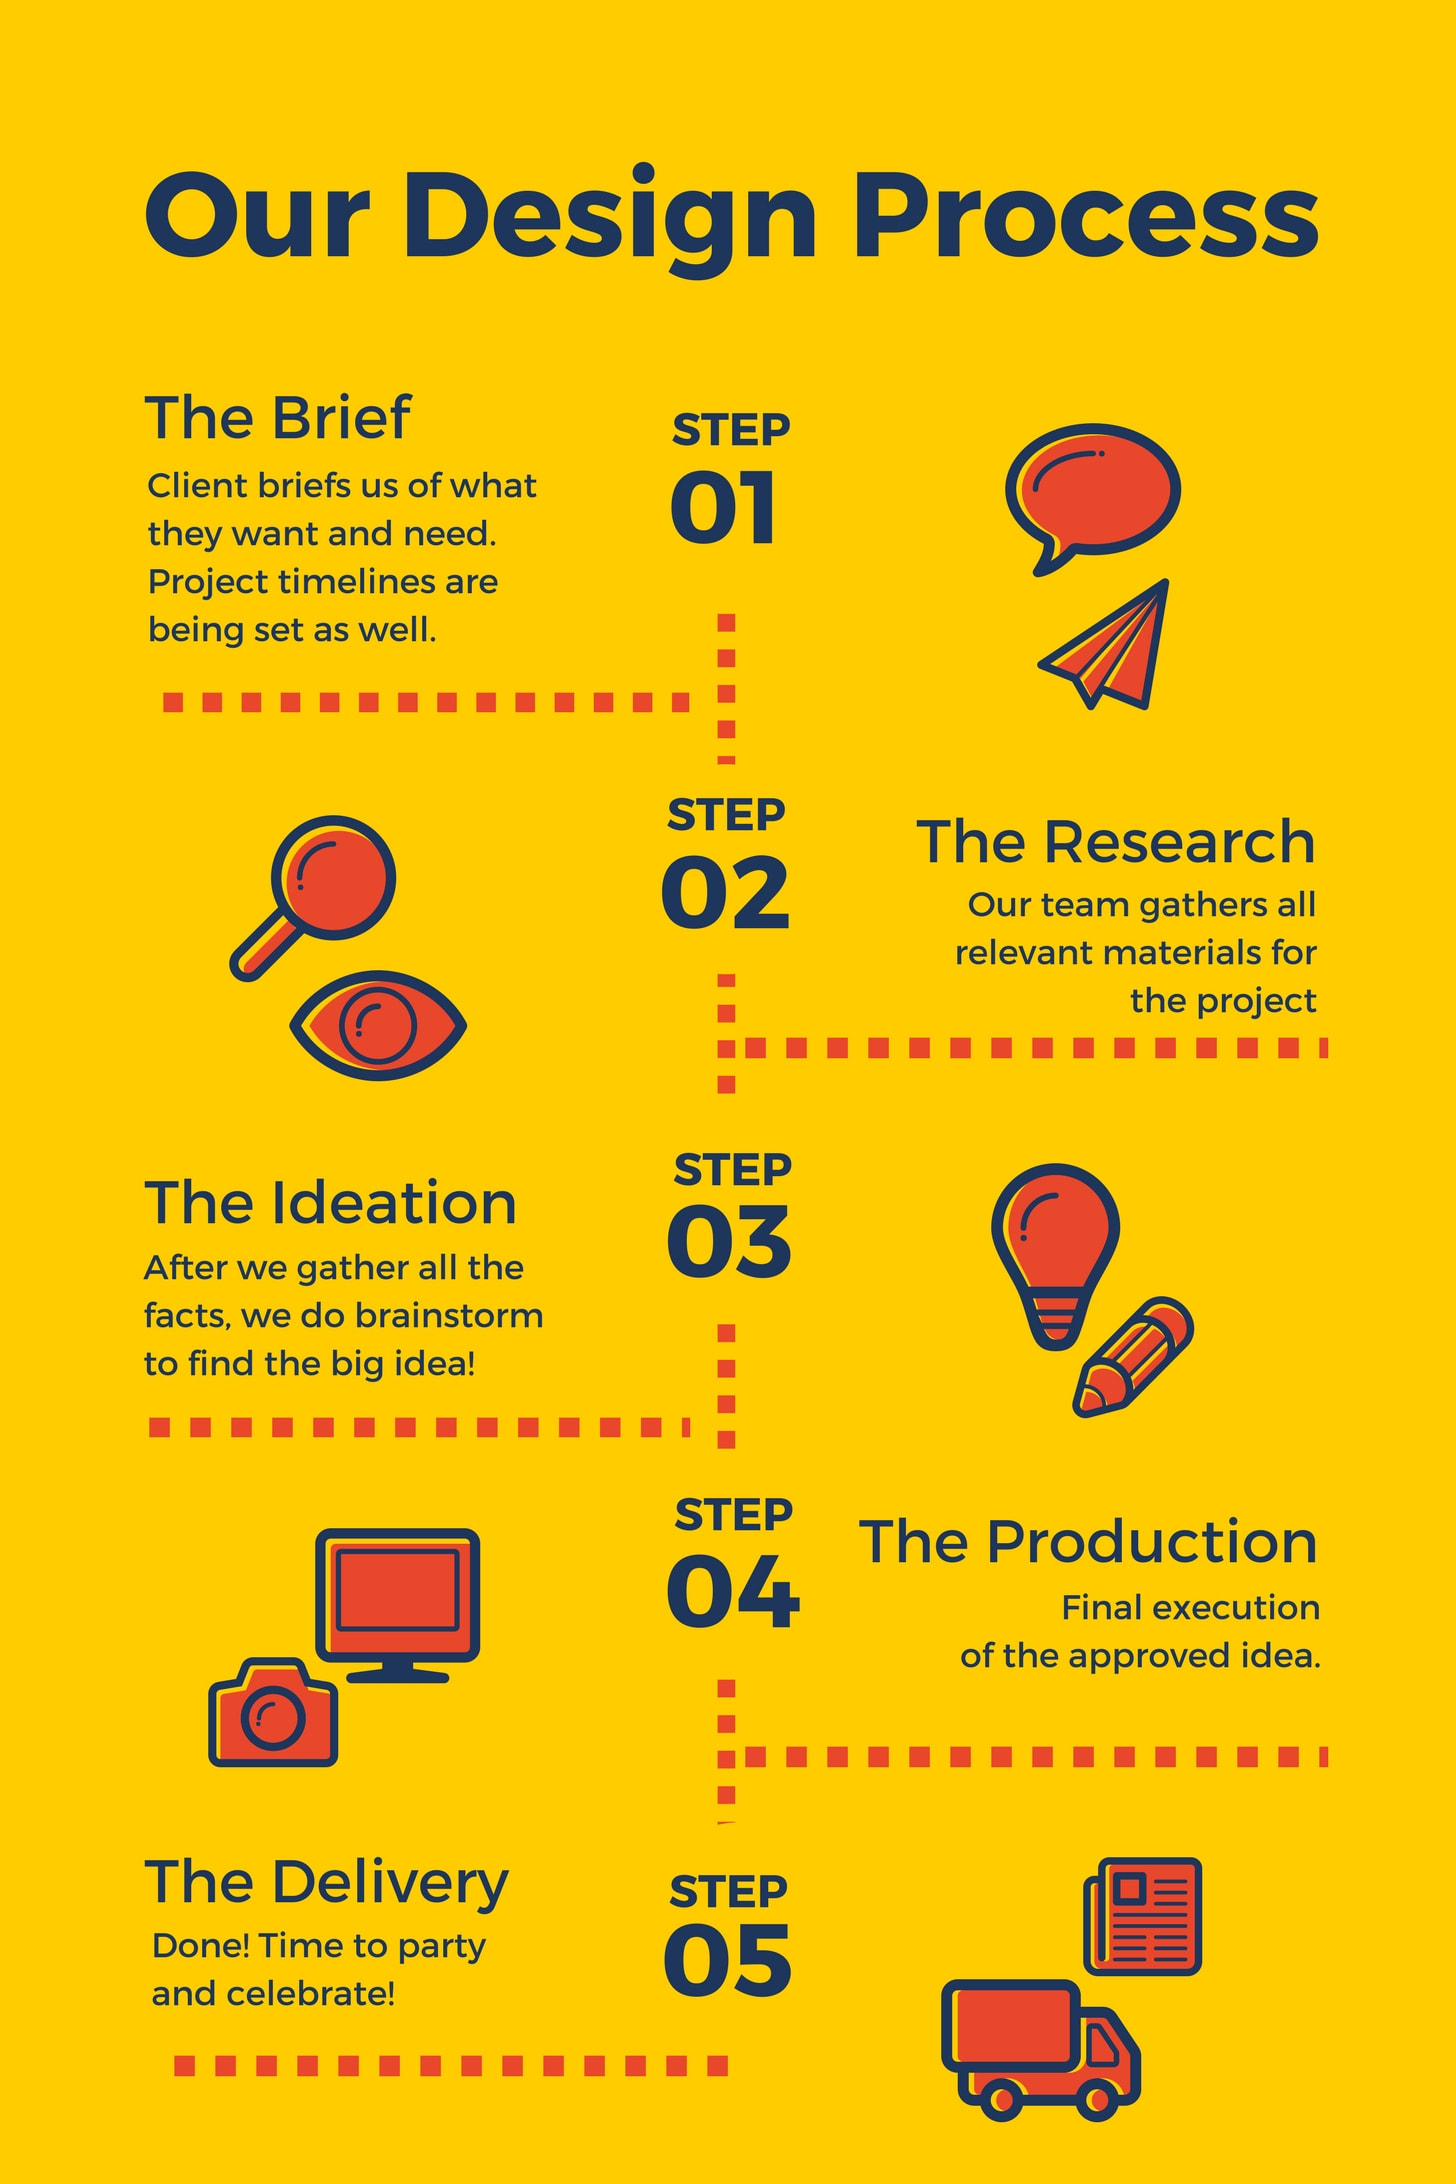 Design Process infographic